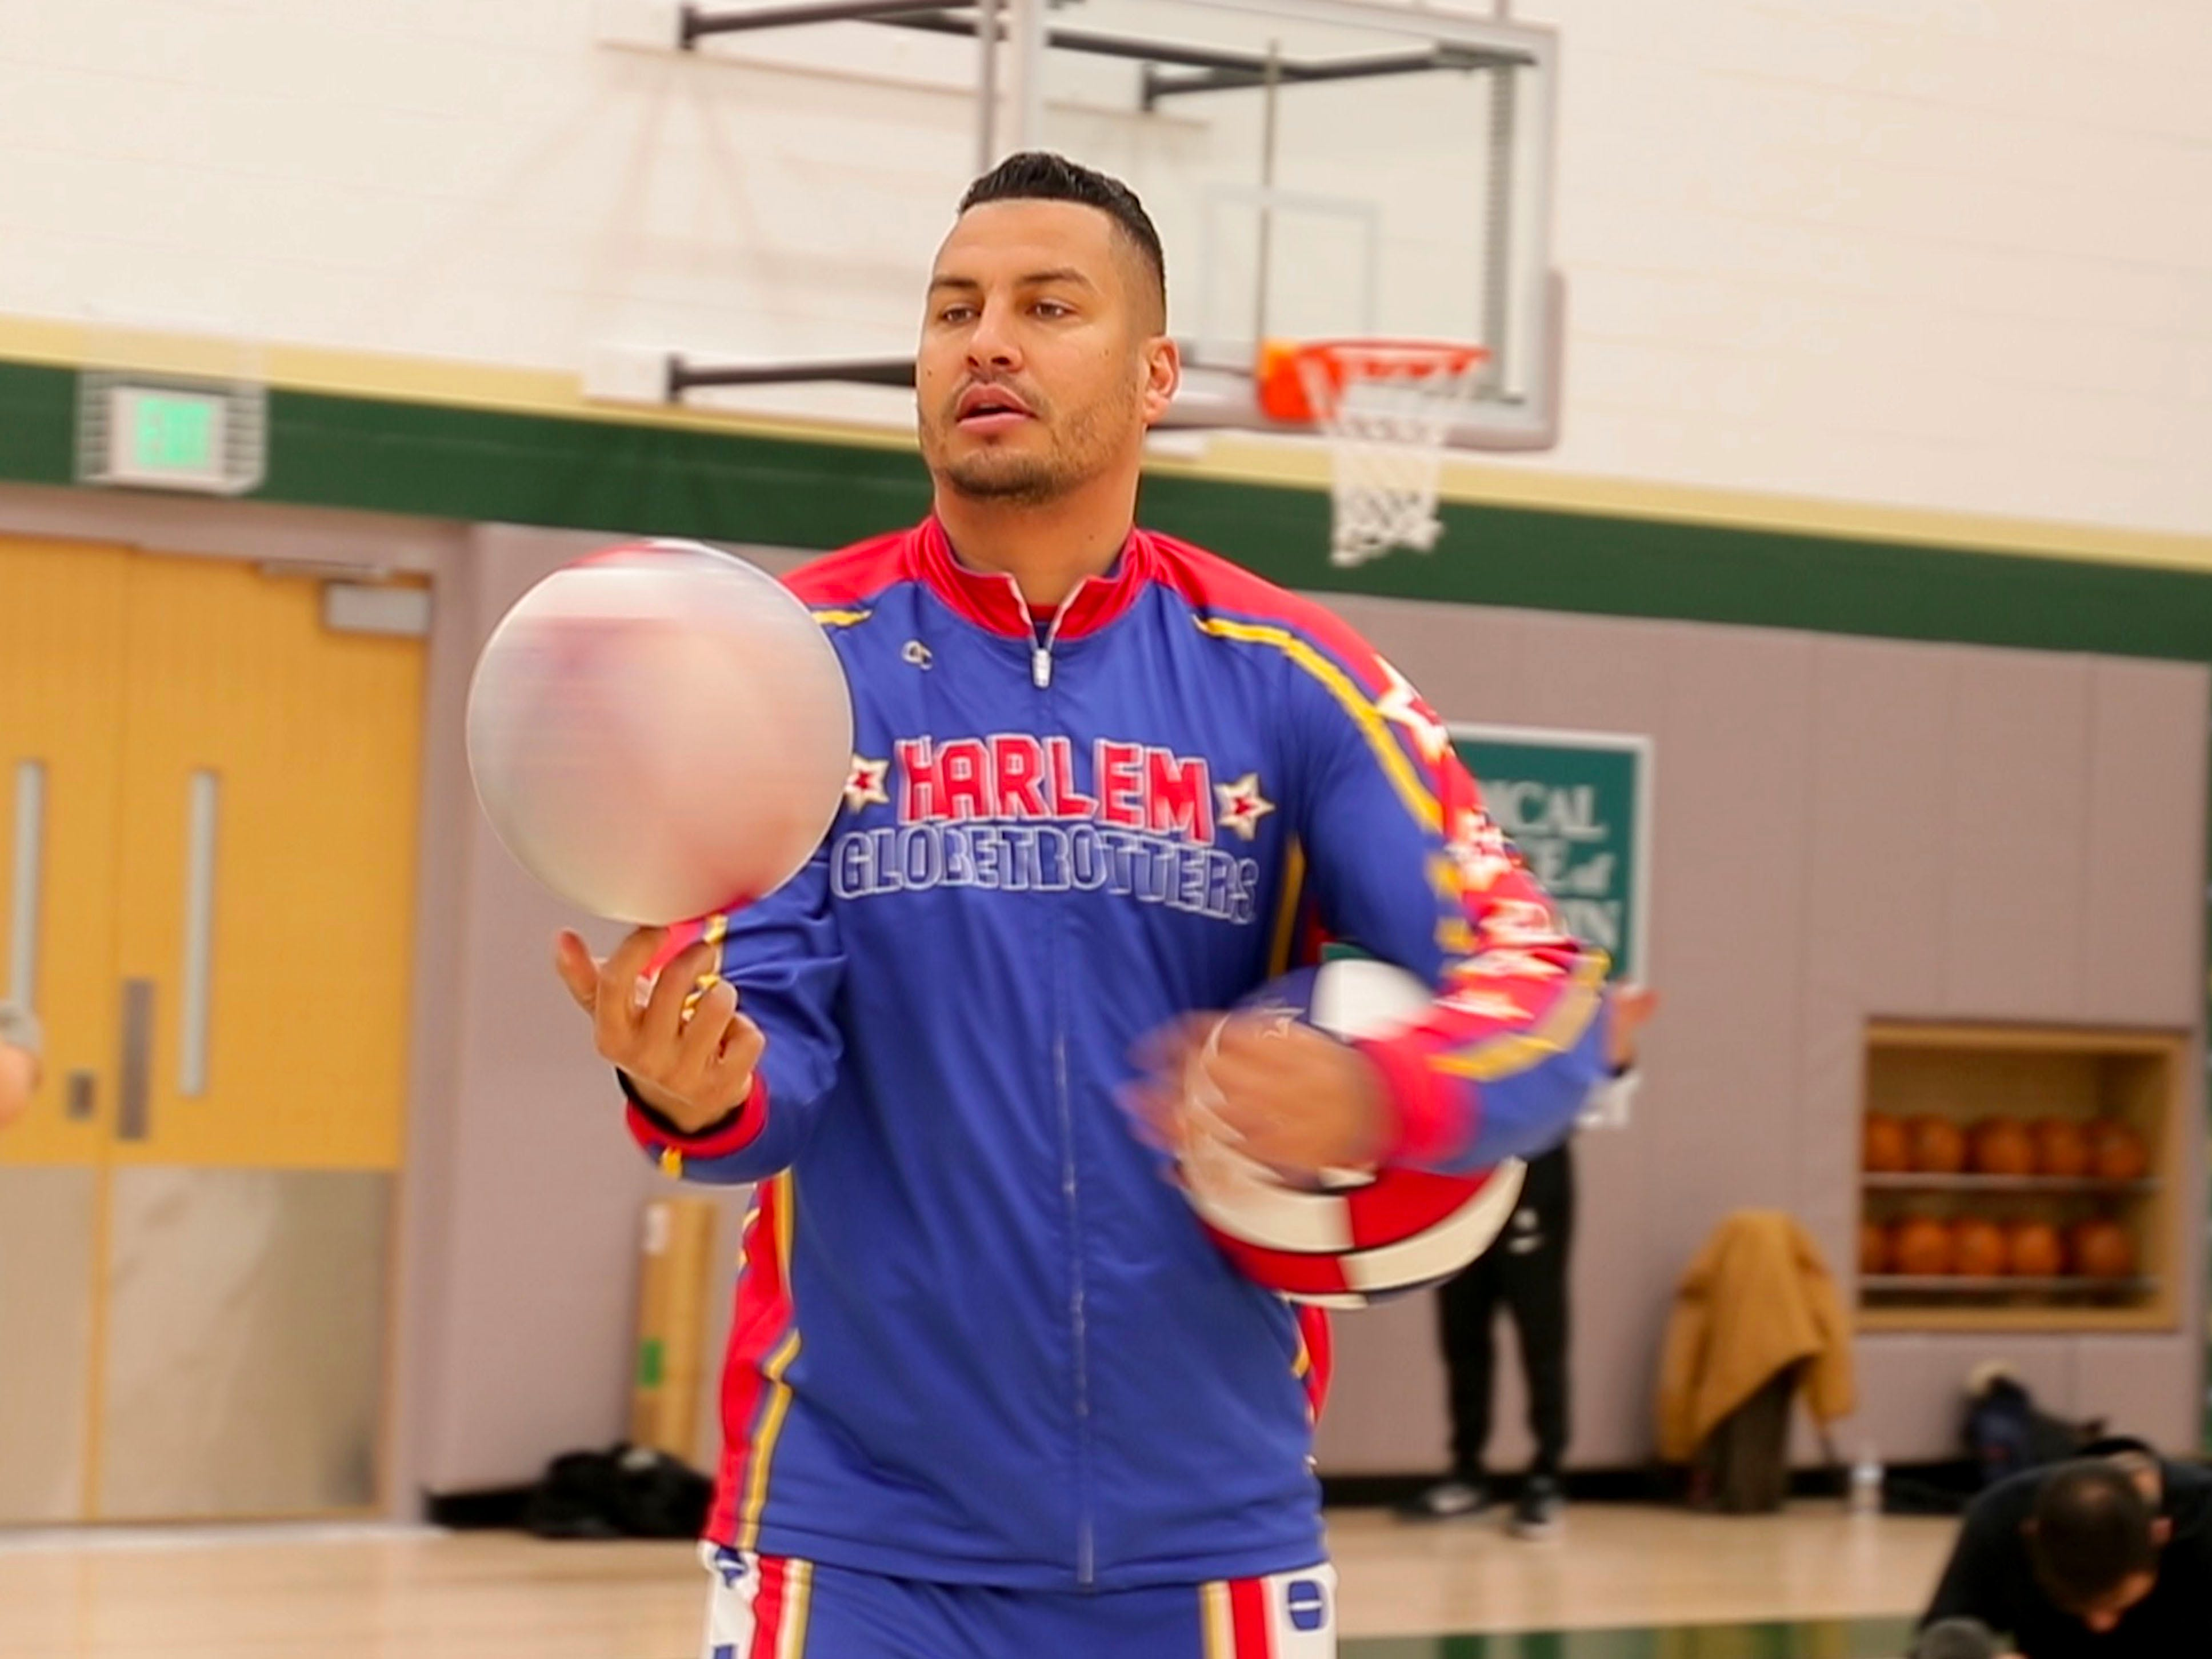 Harlem Globetrotter Orlando El Gato Melendez spins a basketball while doing tricks.